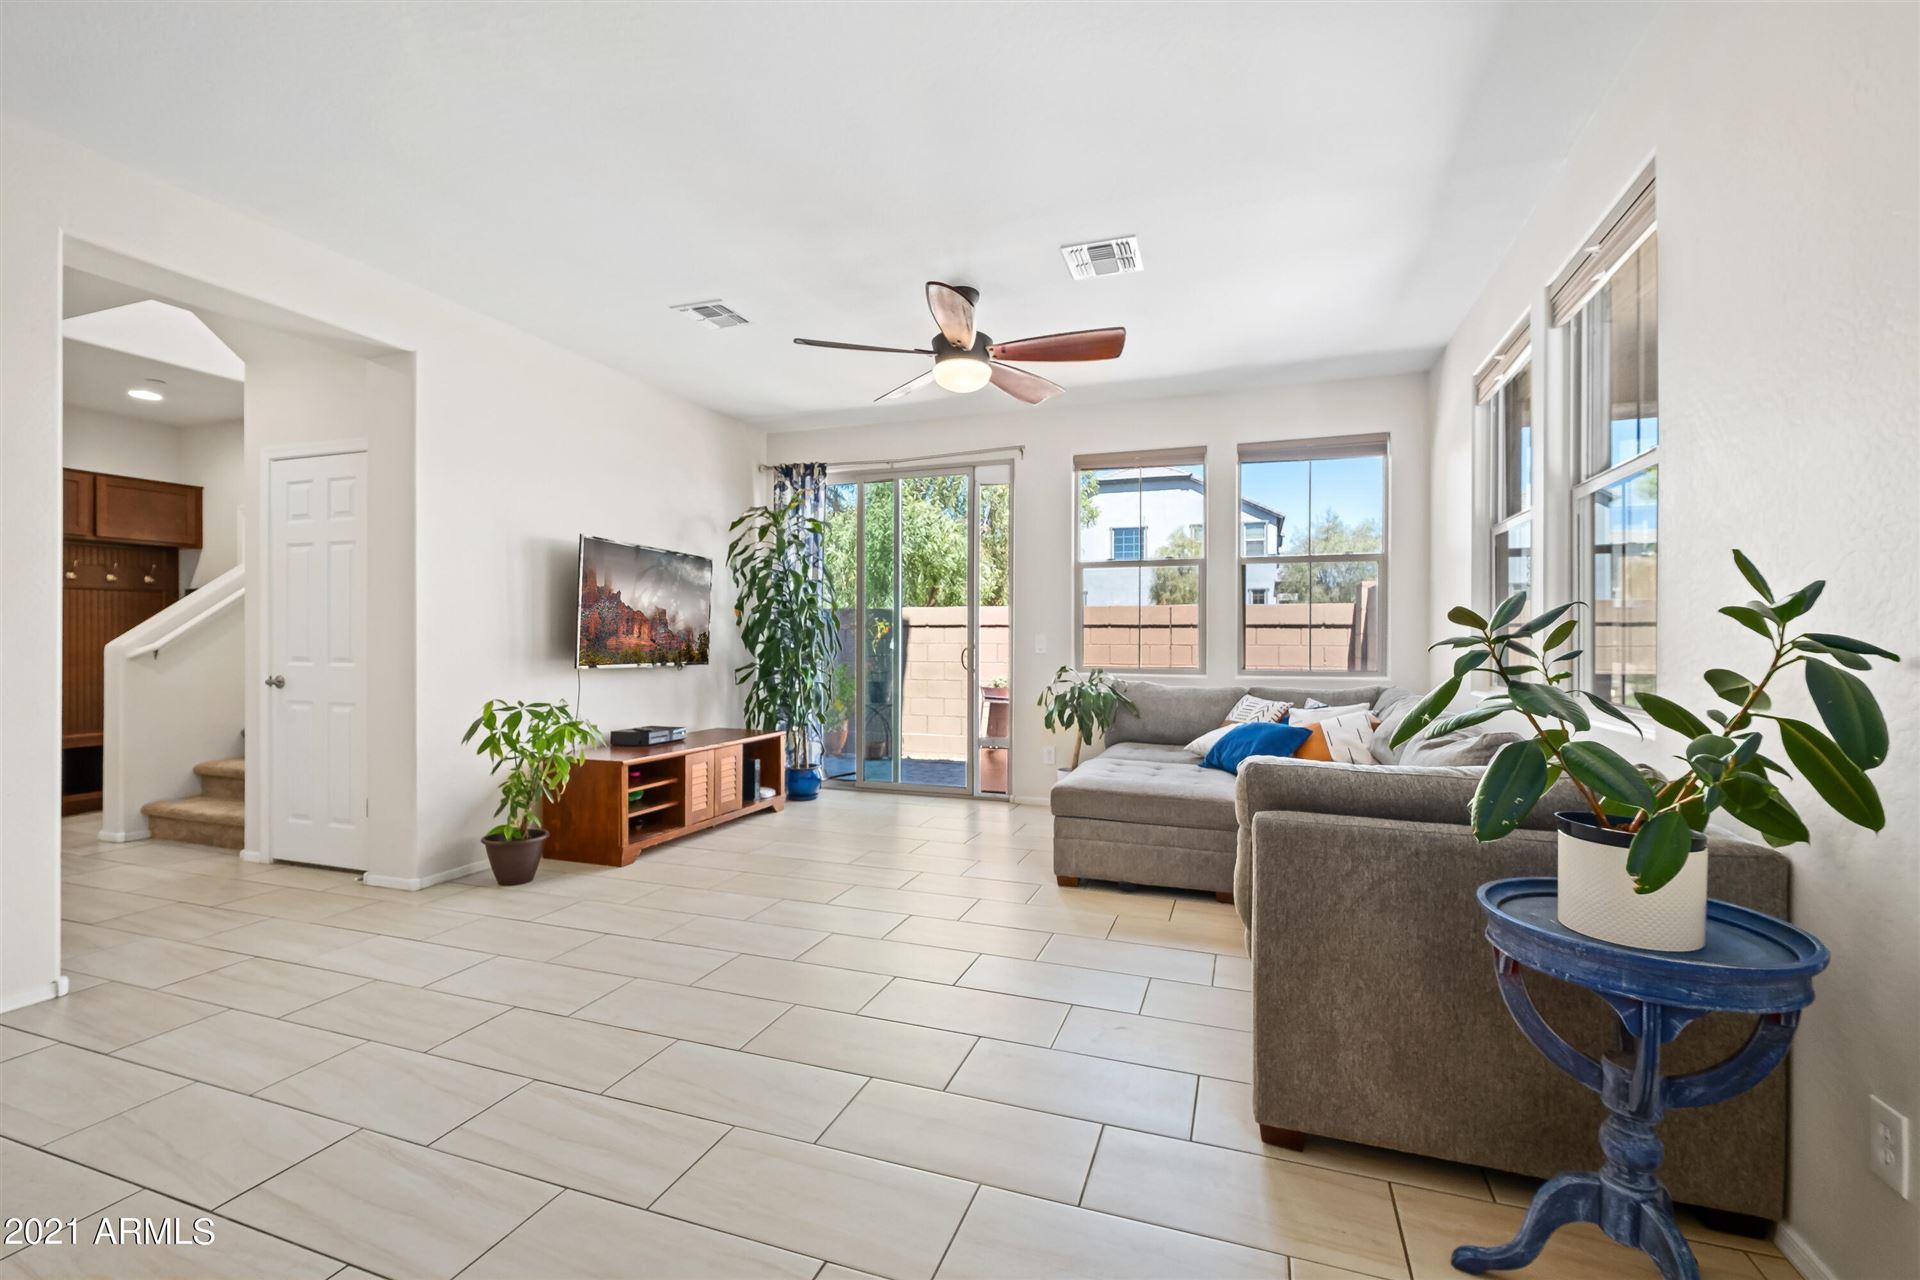 Photo of 255 N 56TH Place, Mesa, AZ 85205 (MLS # 6249408)